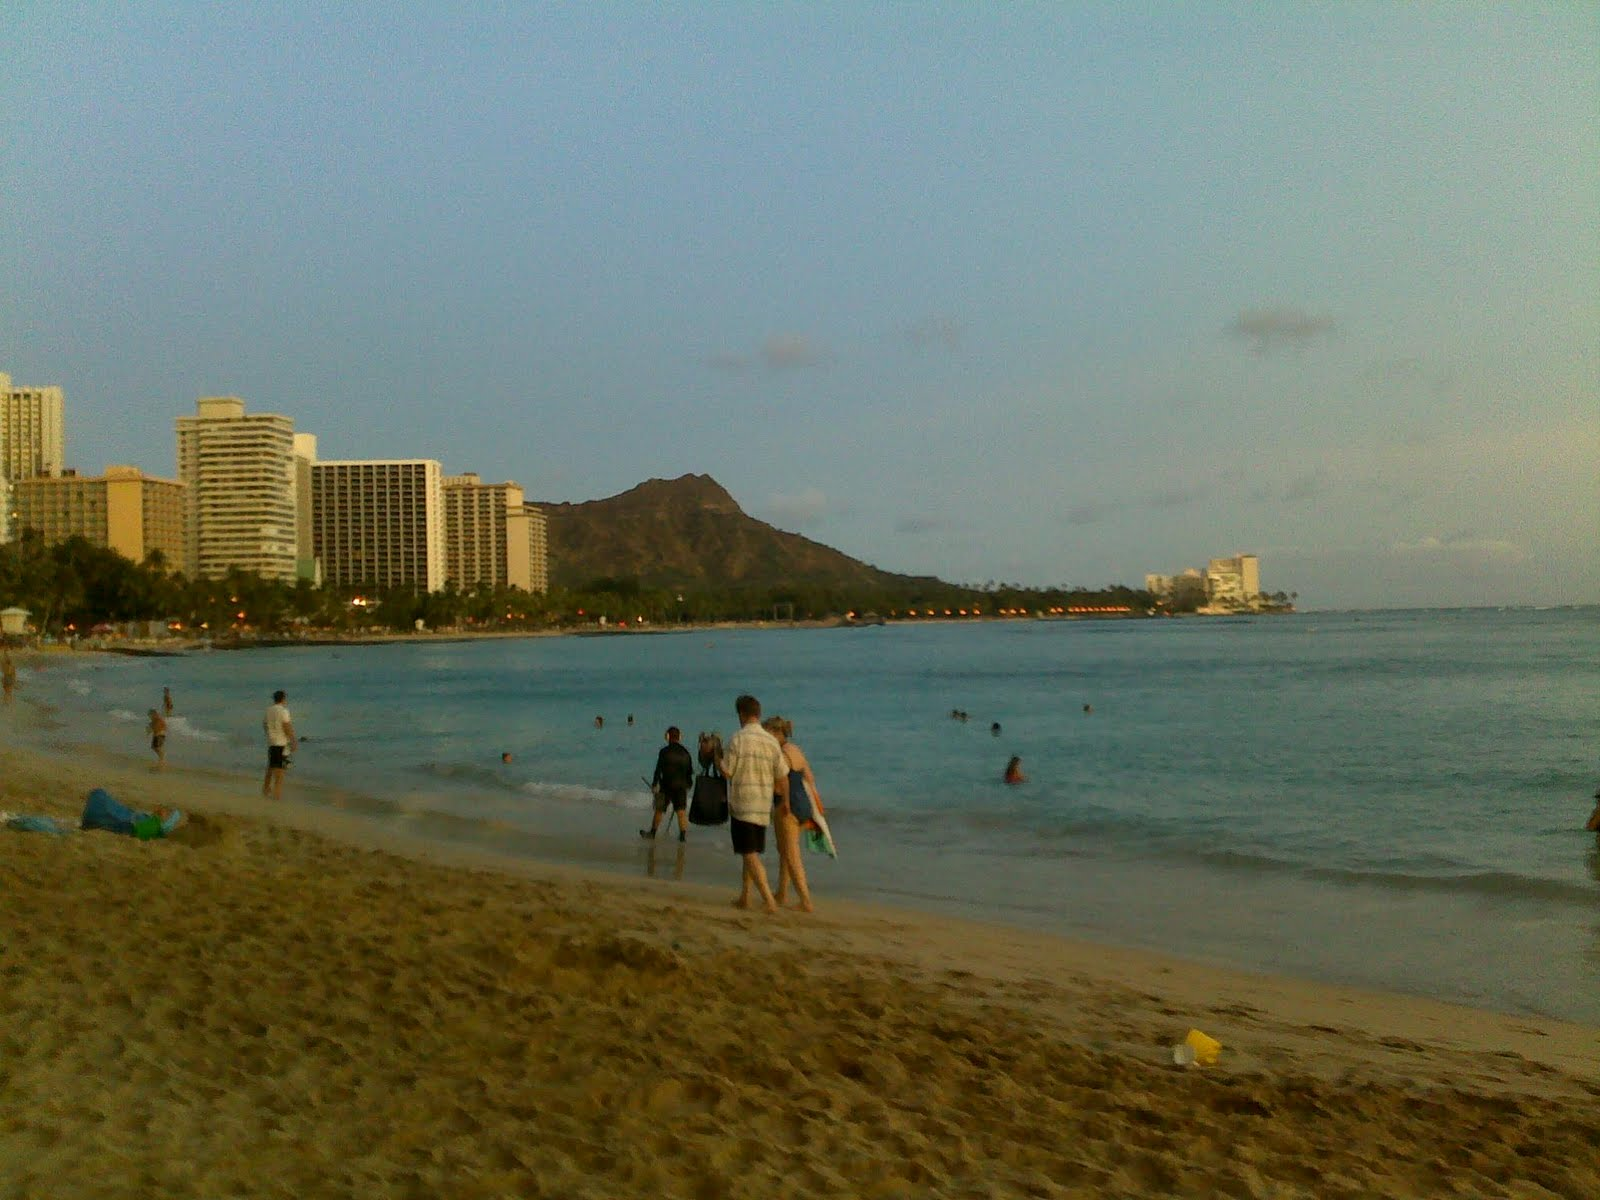 hawaii dream vacation essay hawaii dream vacation essay